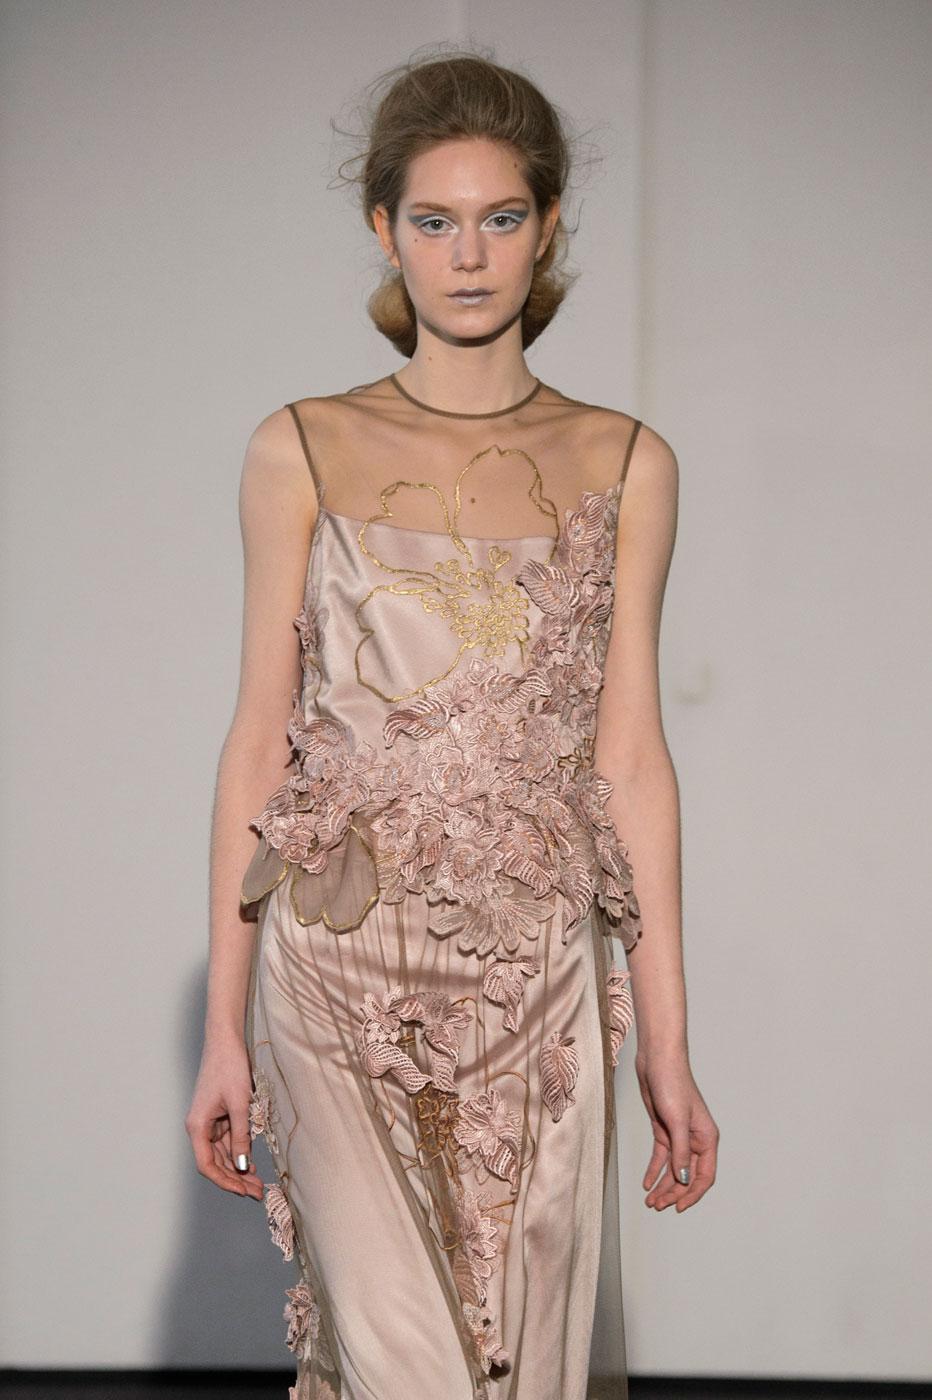 Busardi-fashion-runway-show-haute-couture-paris-spring-2015-the-impression-44